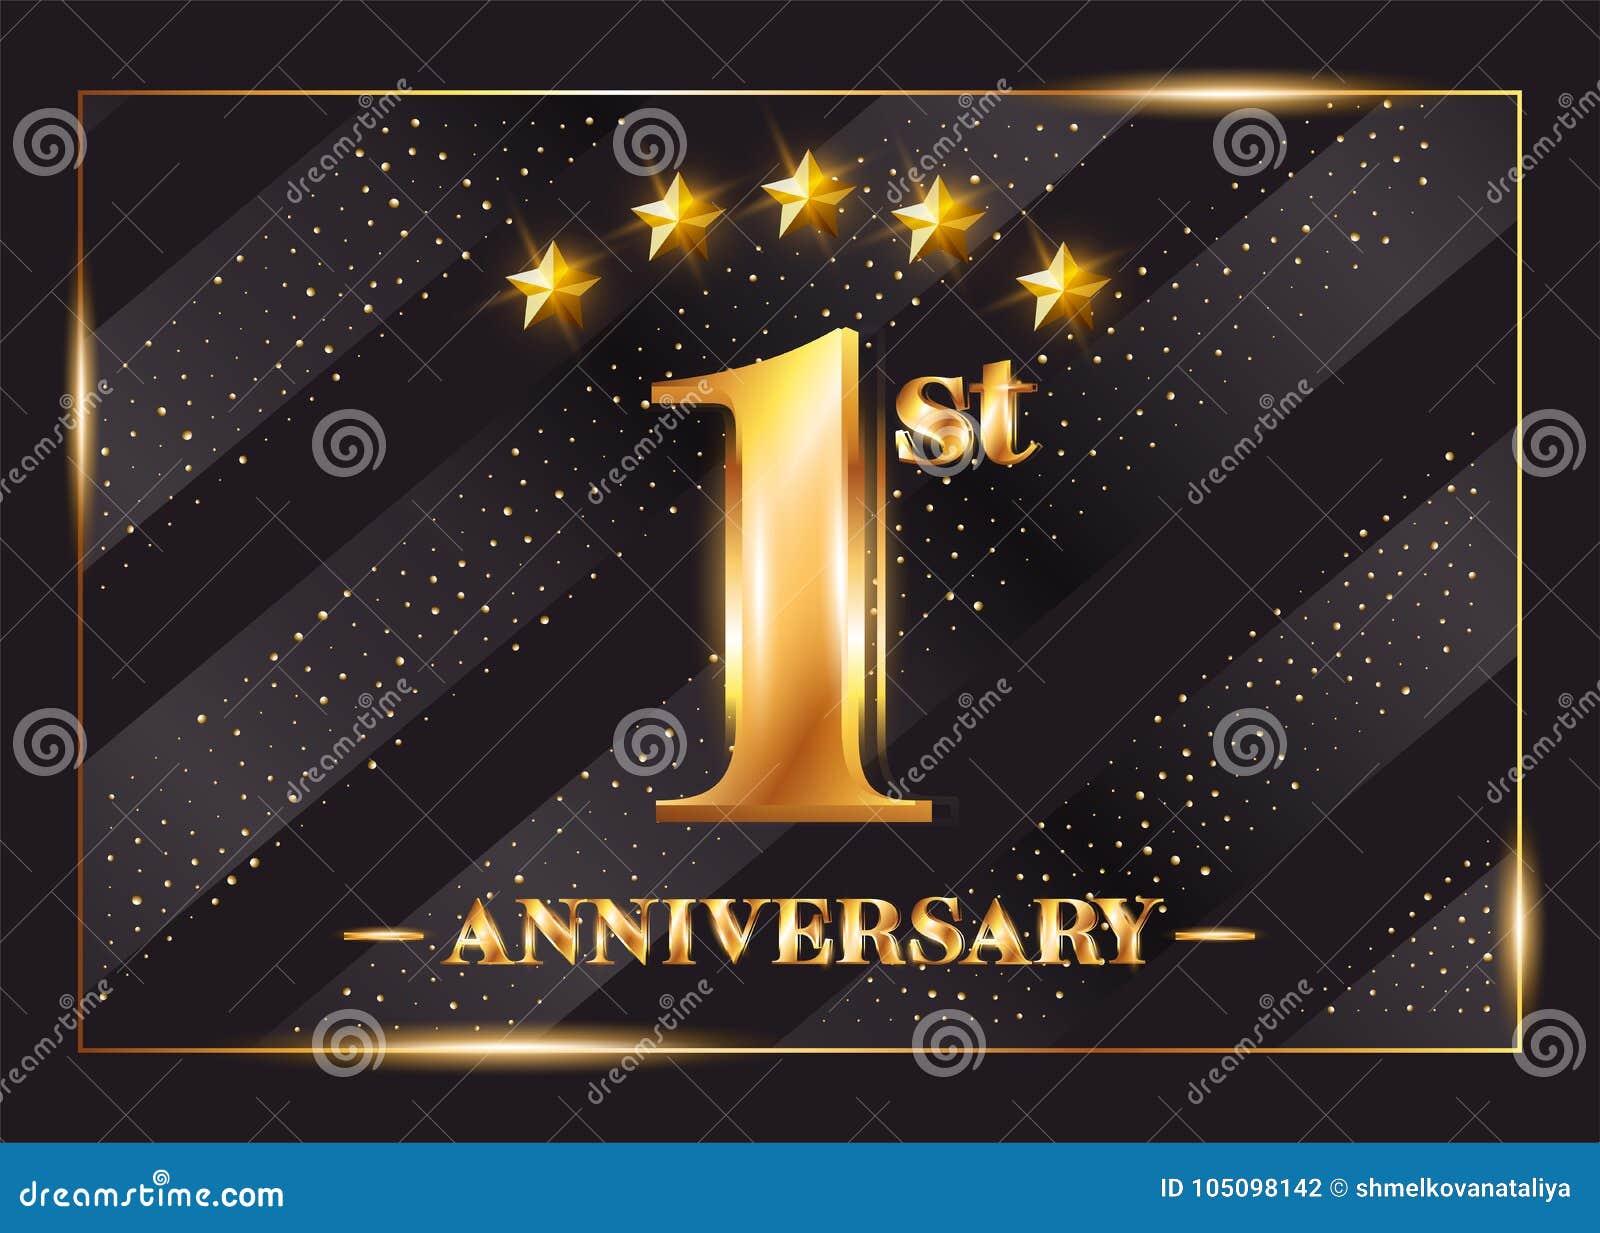 Year anniversary celebration vector logo st anniversary